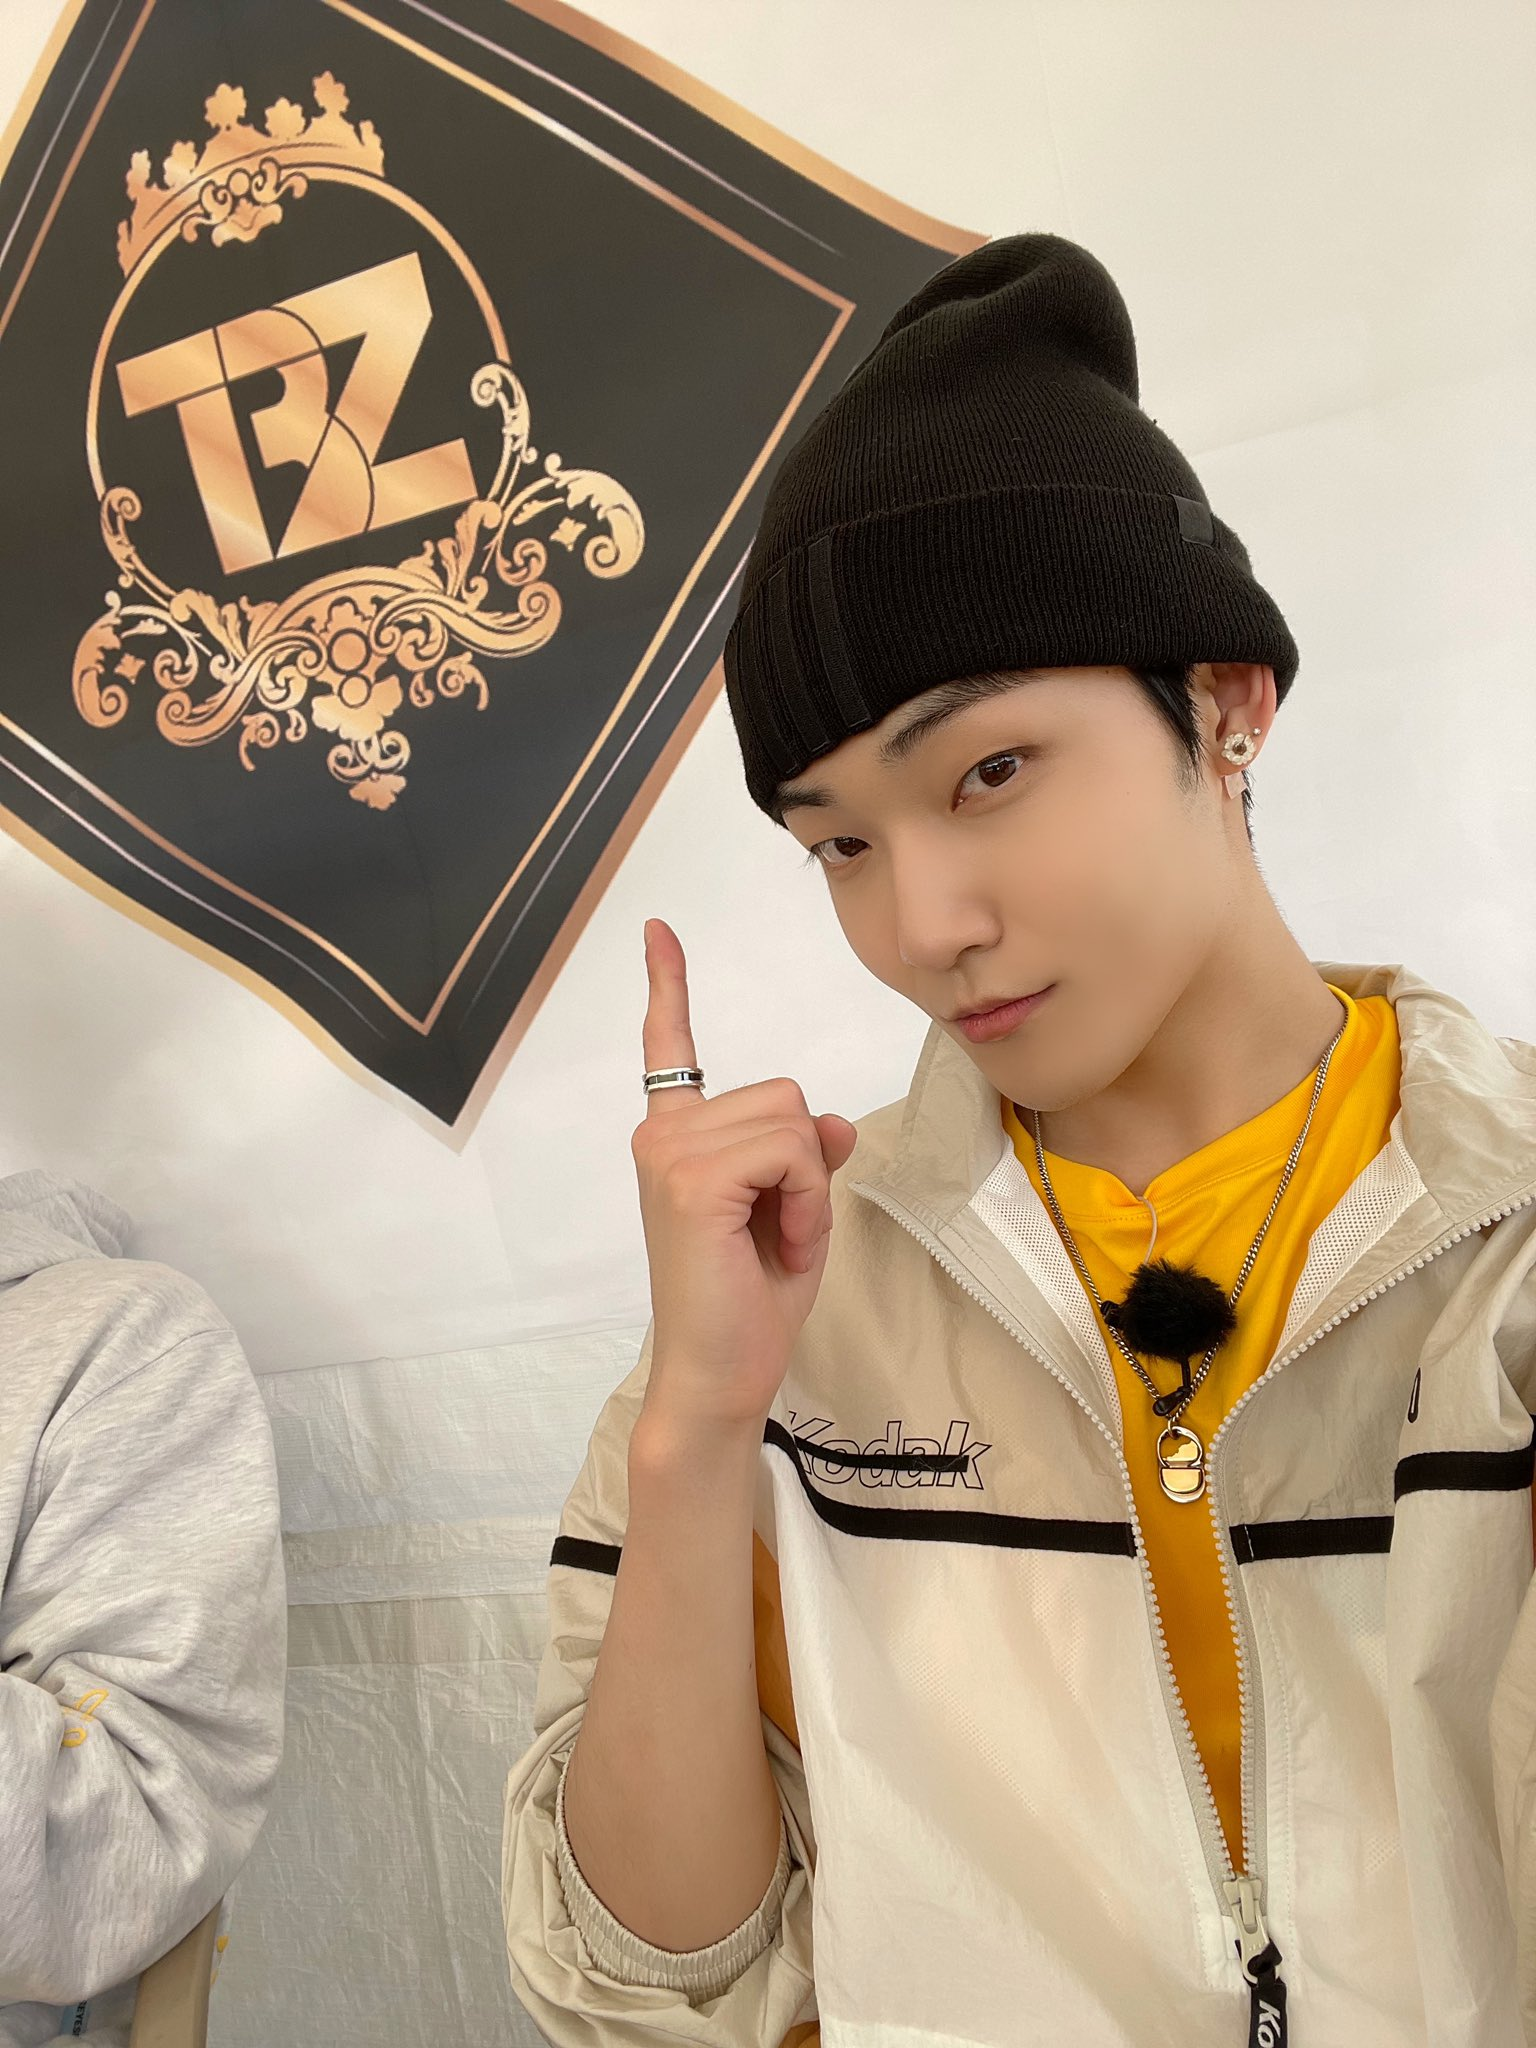 the boyz kevin @WE_THE_BOYZ